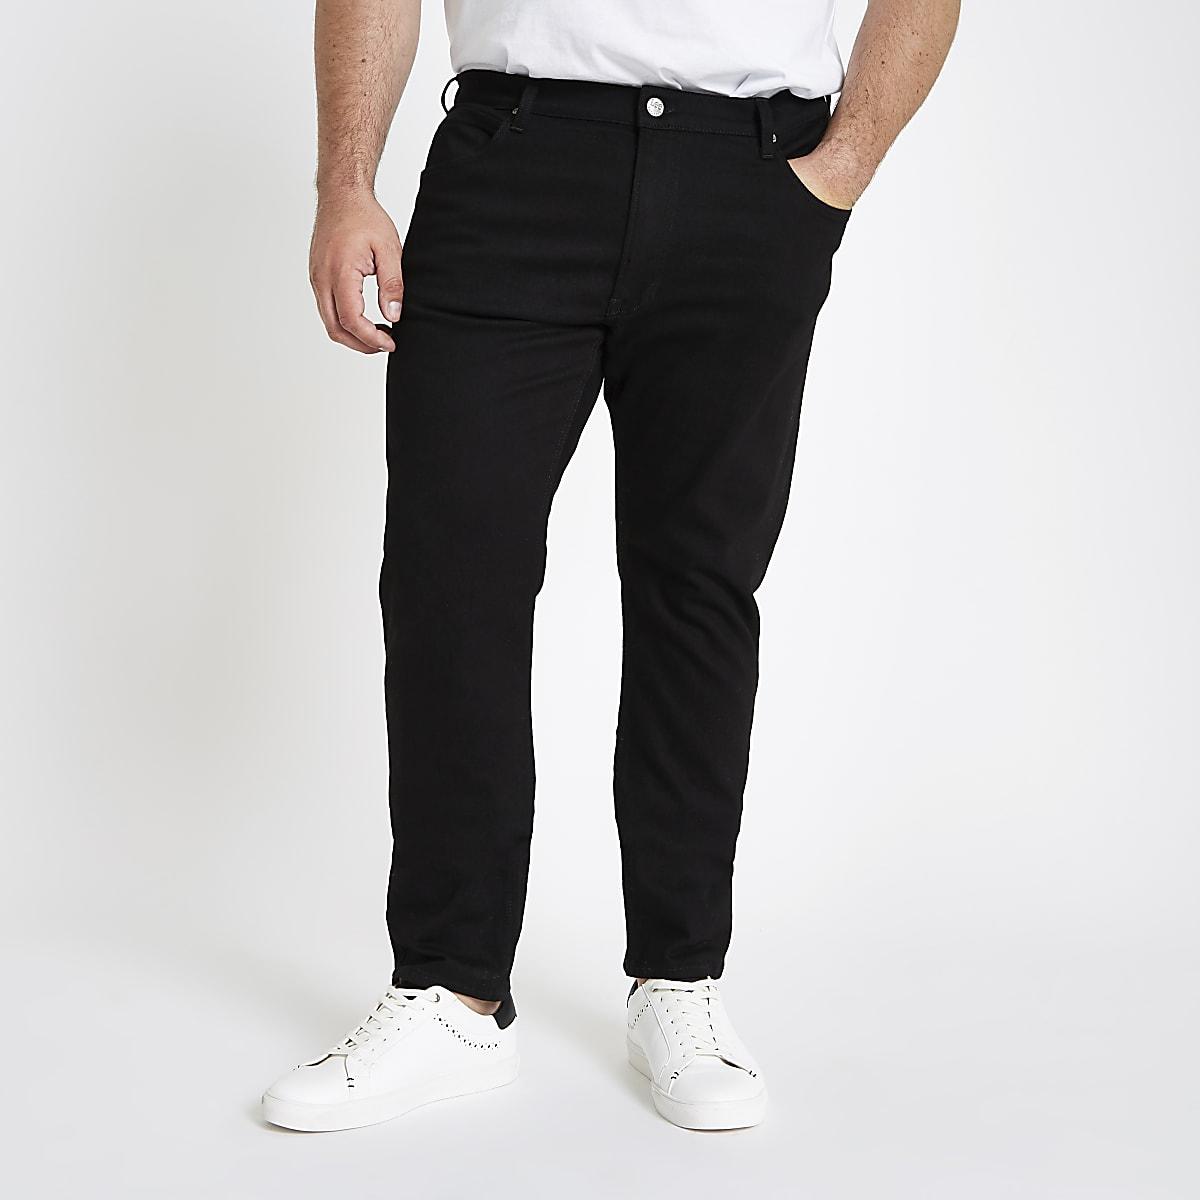 Lee Big and Tall black Luke jeans